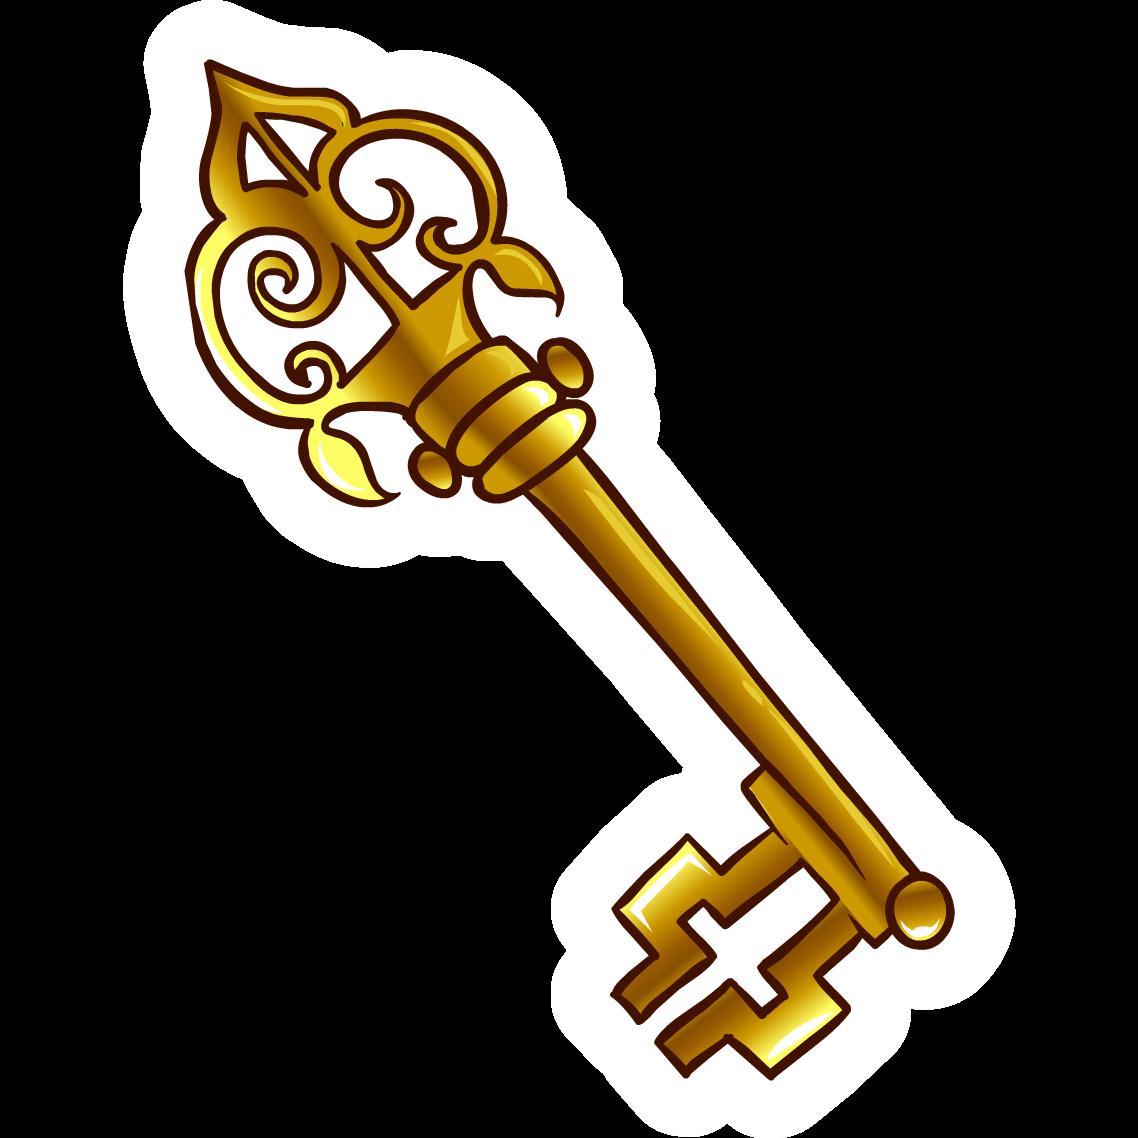 Pics Of Keys - ClipArt Best